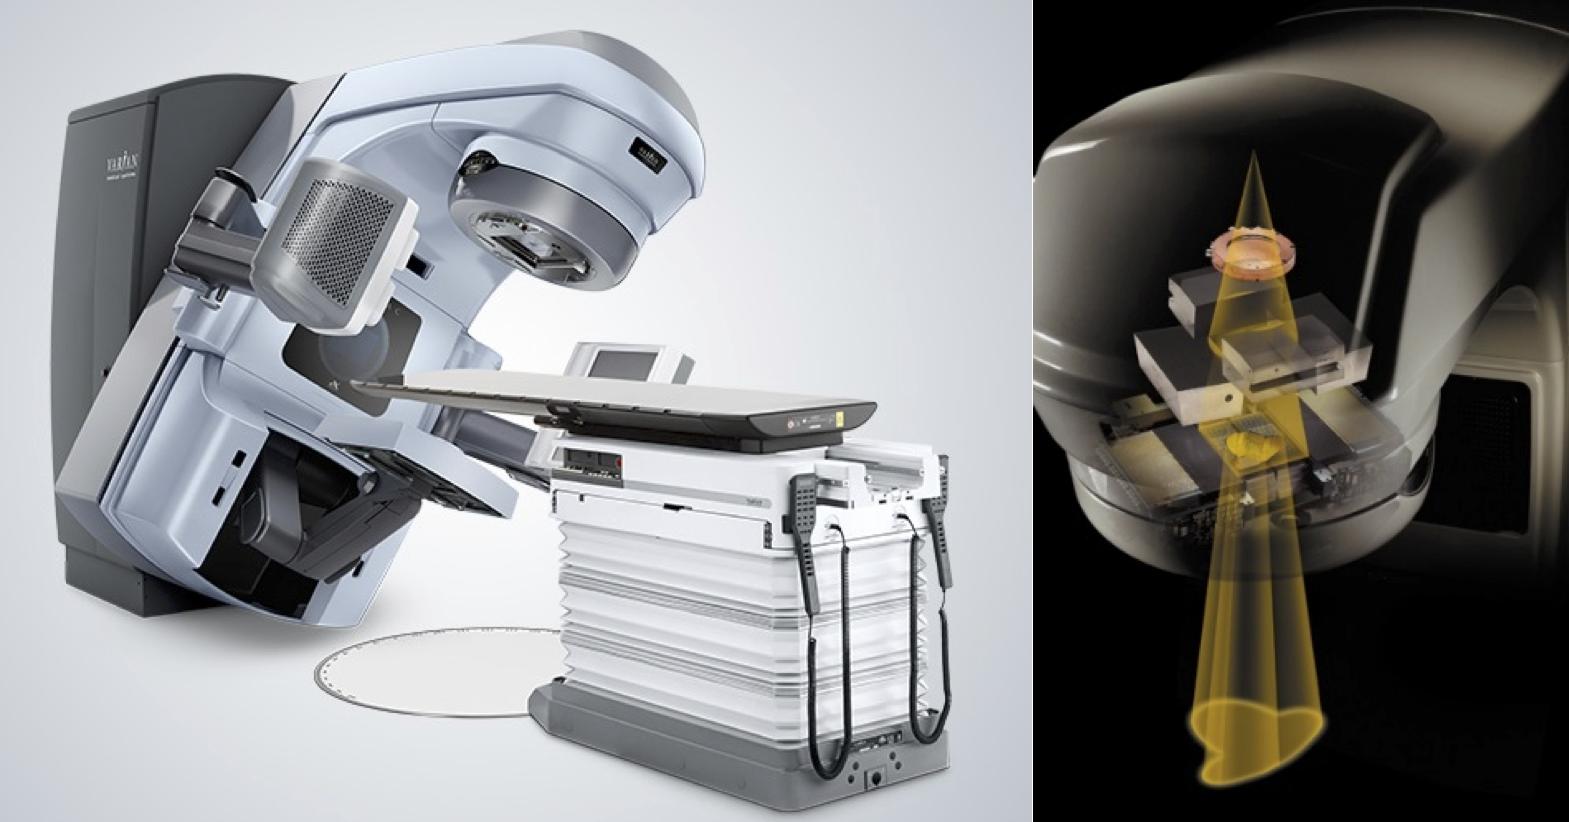 Radiotherapy - Varian